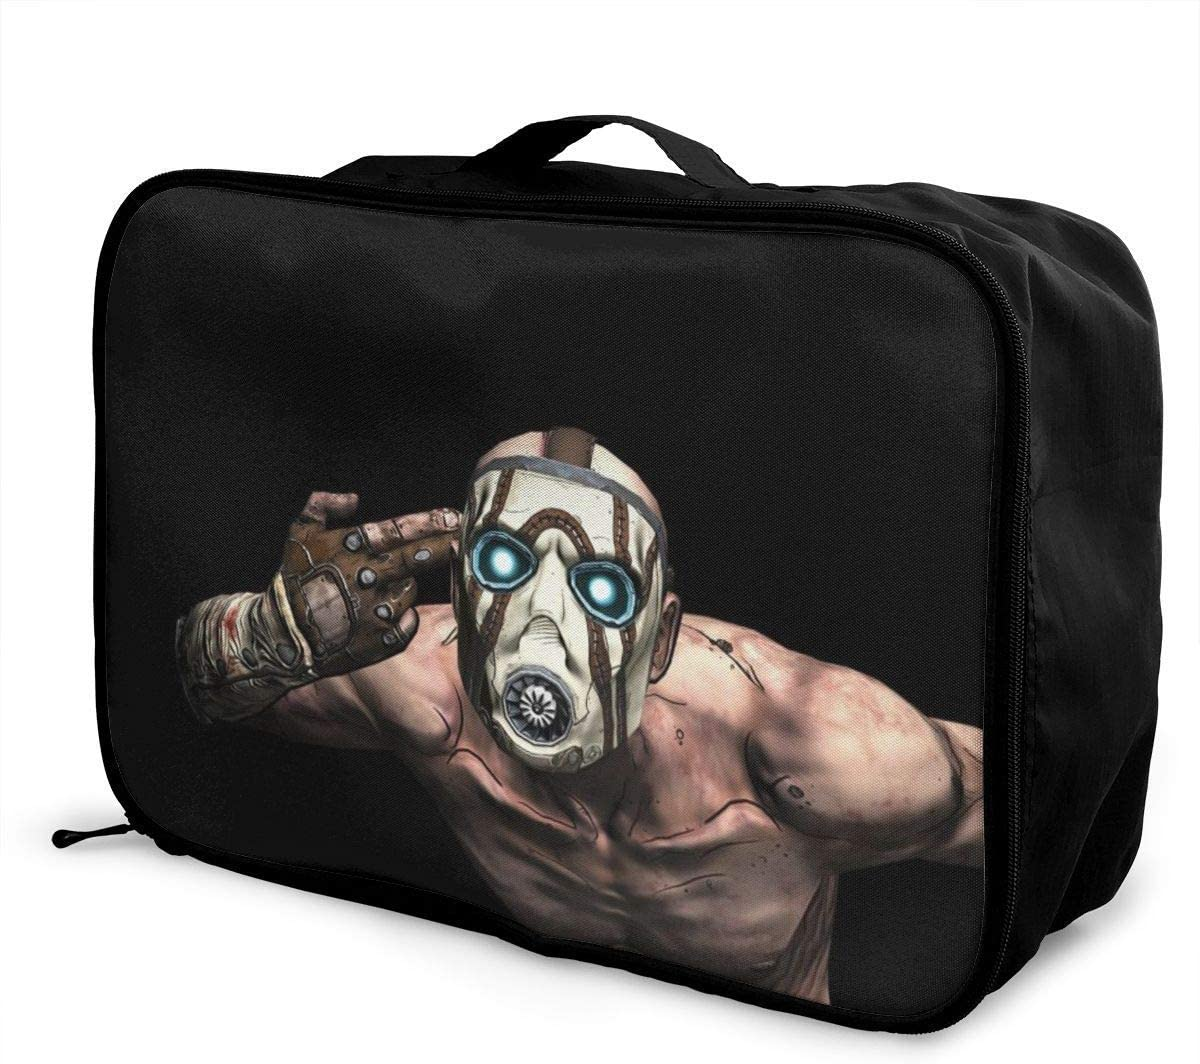 Travel Luggage Duffle Bag Lightweight Portable Handbag National Flag Day Large Capacity Waterproof Foldable Storage Tote